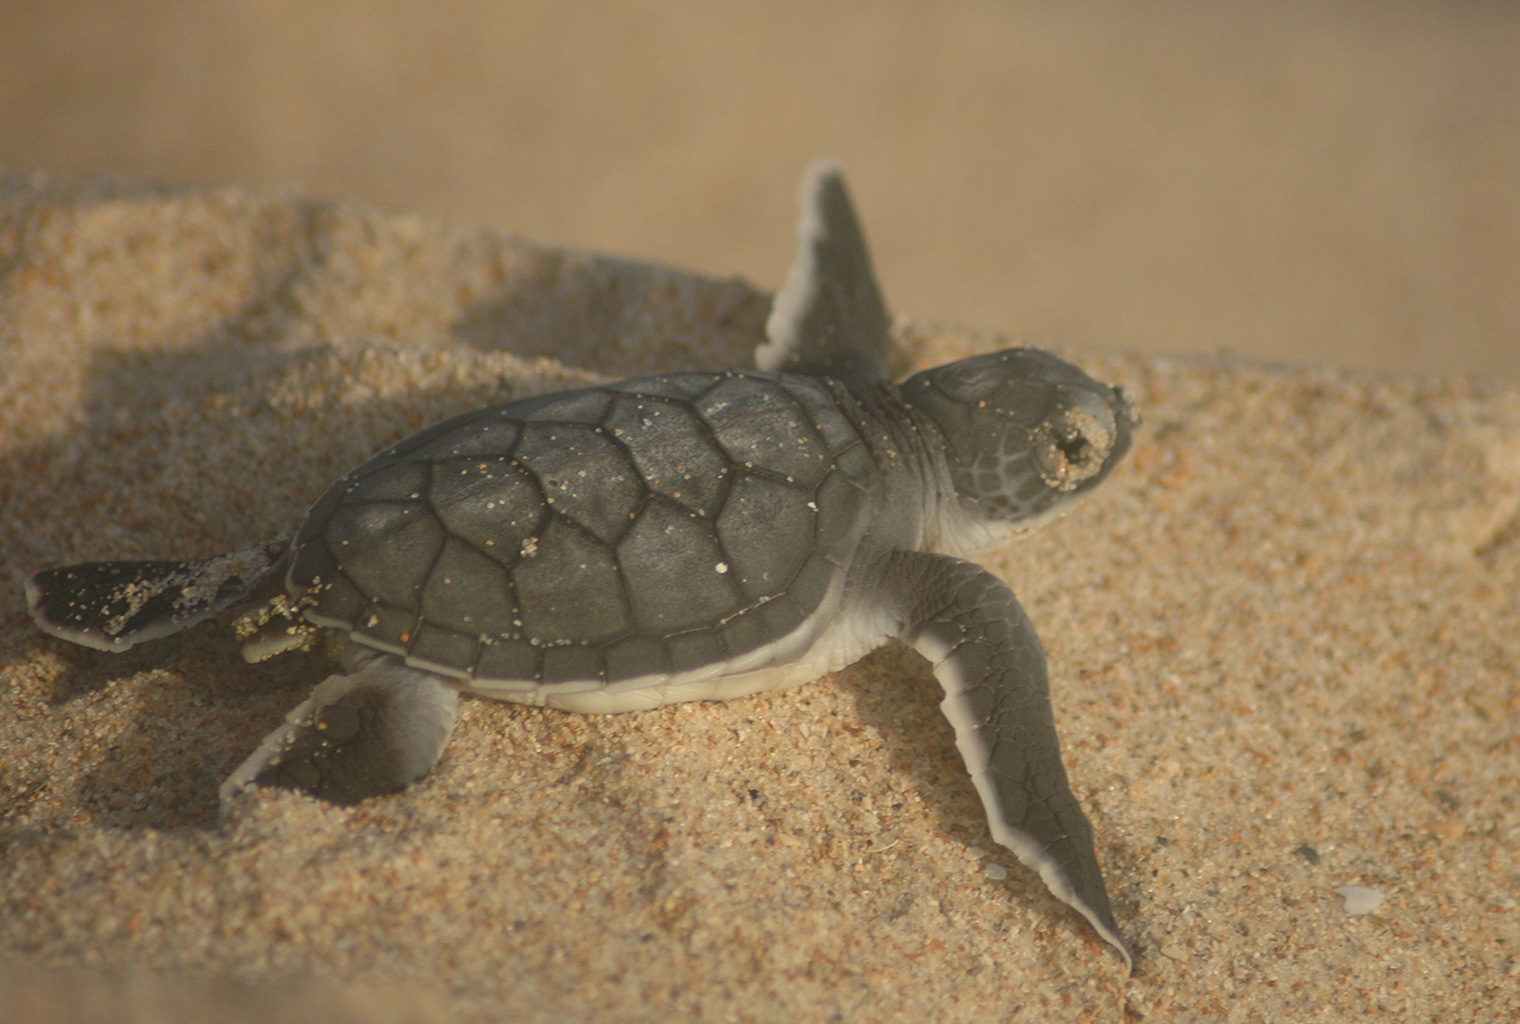 Mainland-Coast-Kenya-Turtle